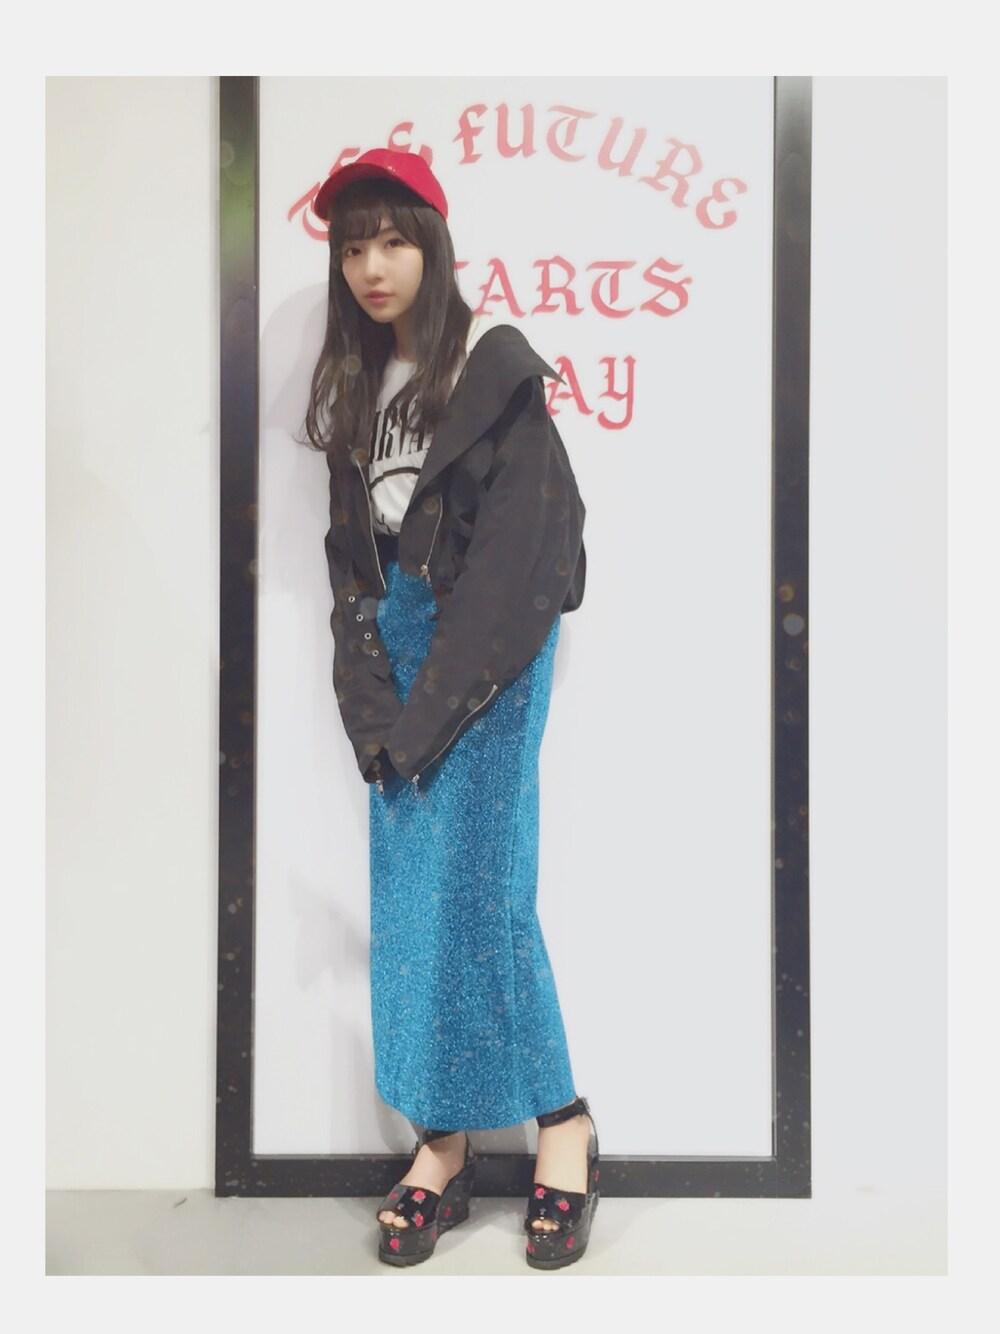 【NMB48】村瀬紗英応援スレ☆33【さえぴぃ】 [無断転載禁止]©2ch.netYouTube動画>20本 ->画像>1103枚